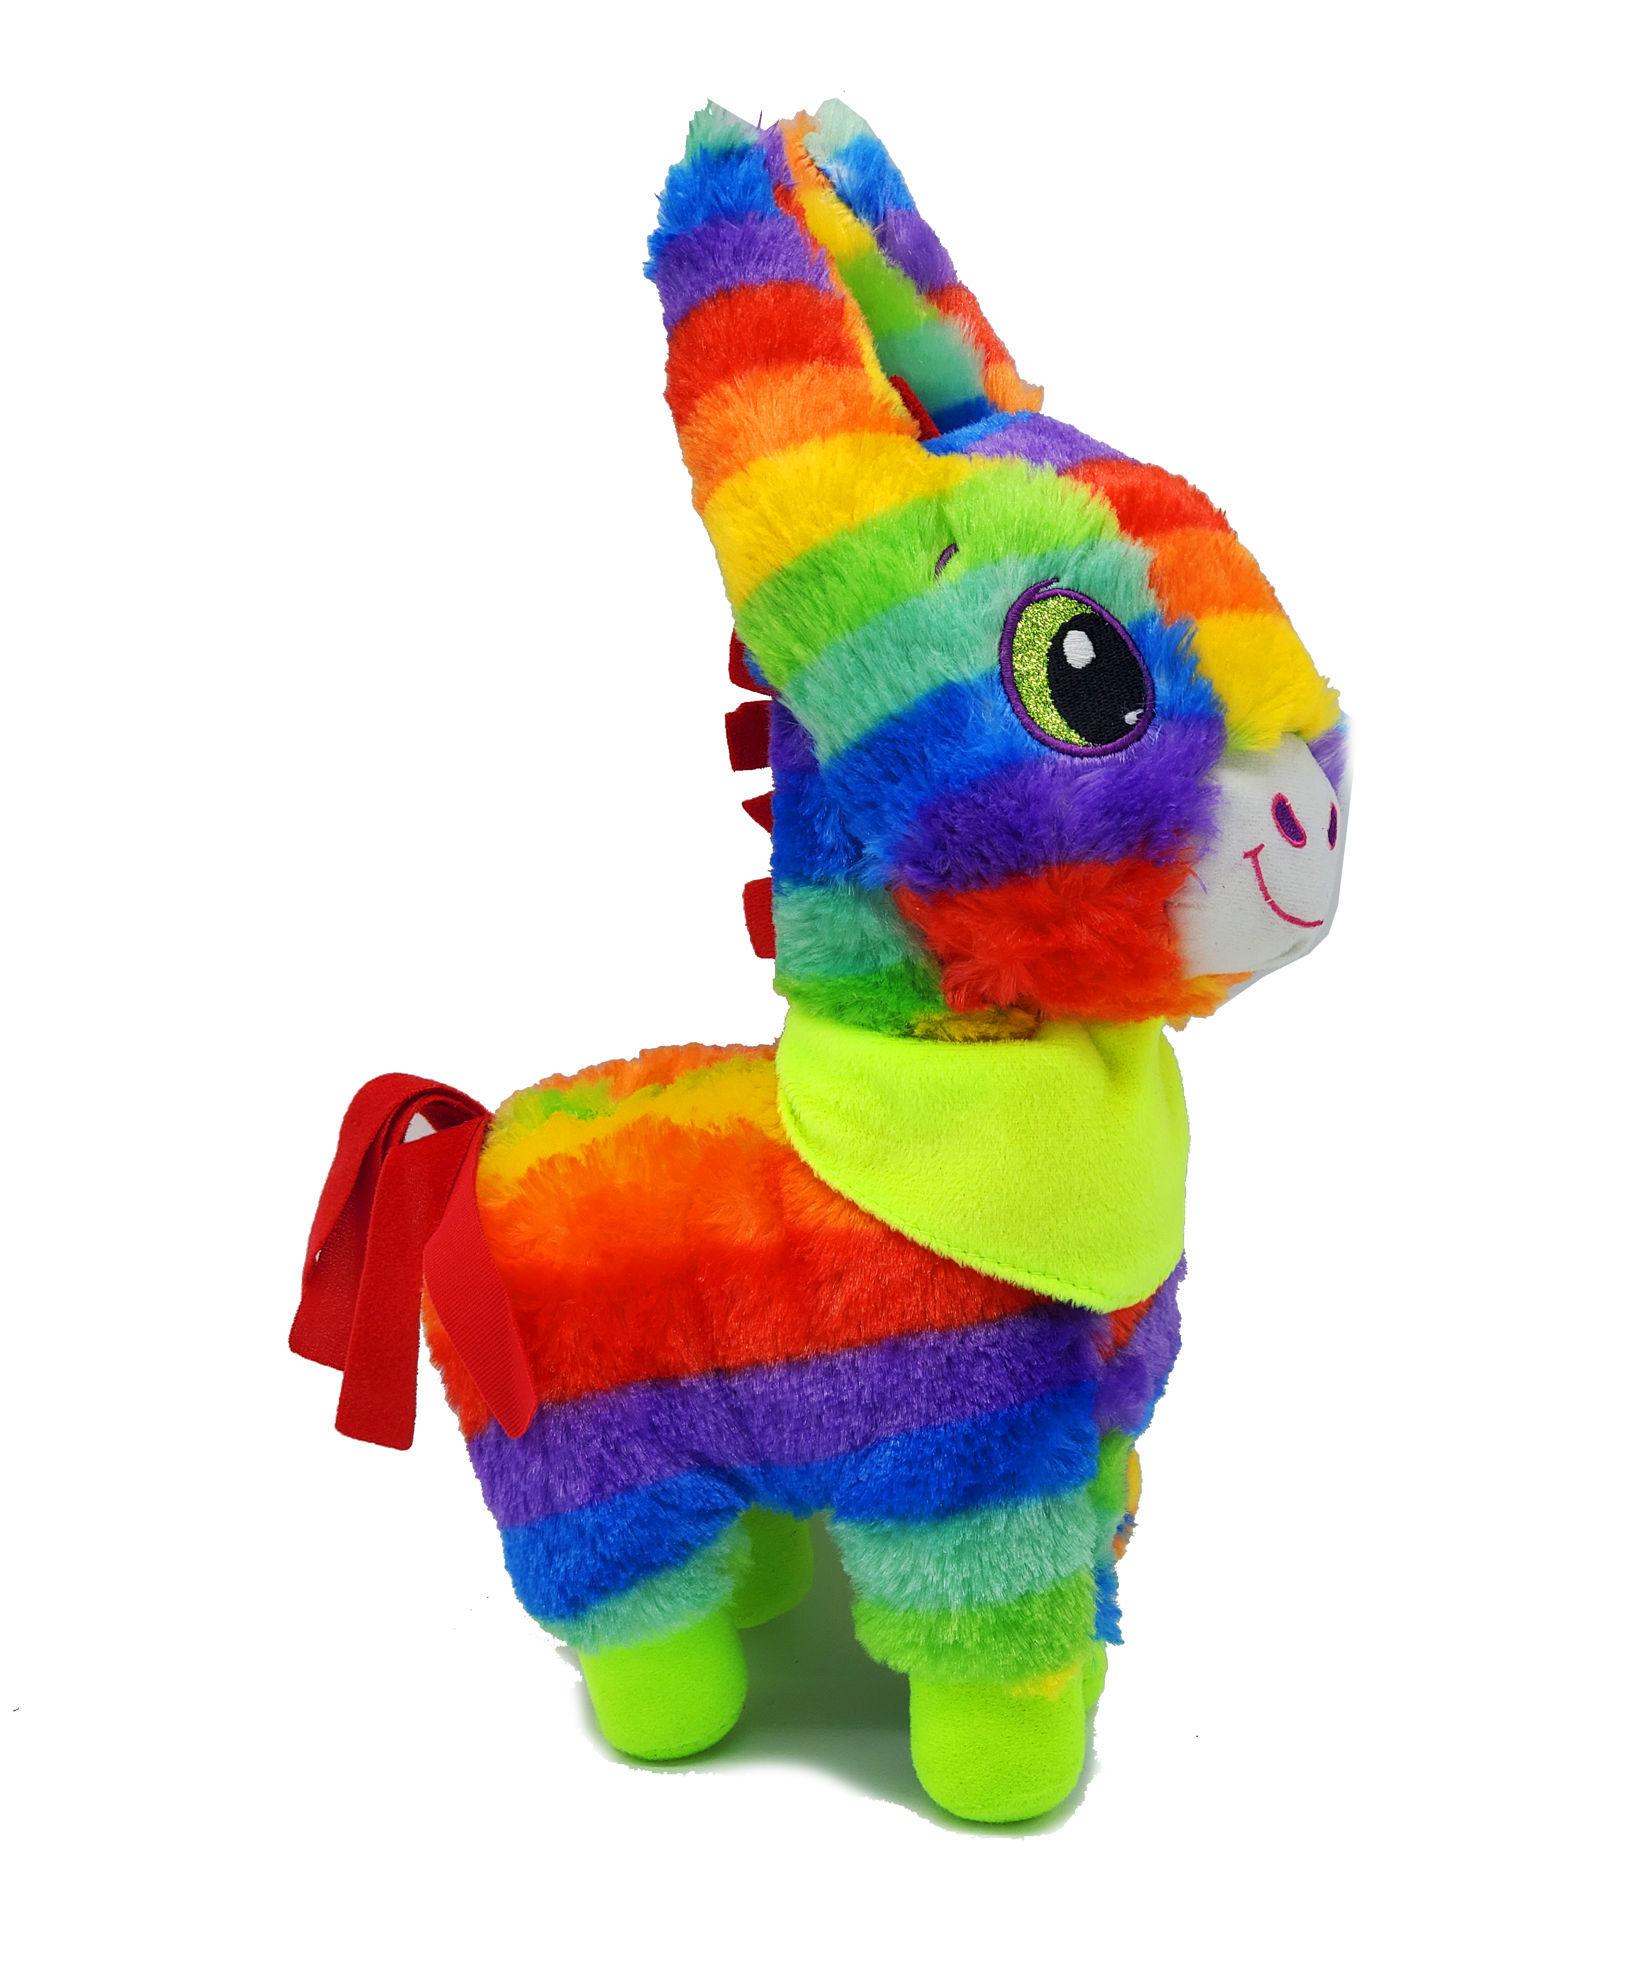 Picture of Rainbow Llama - Plush Toy